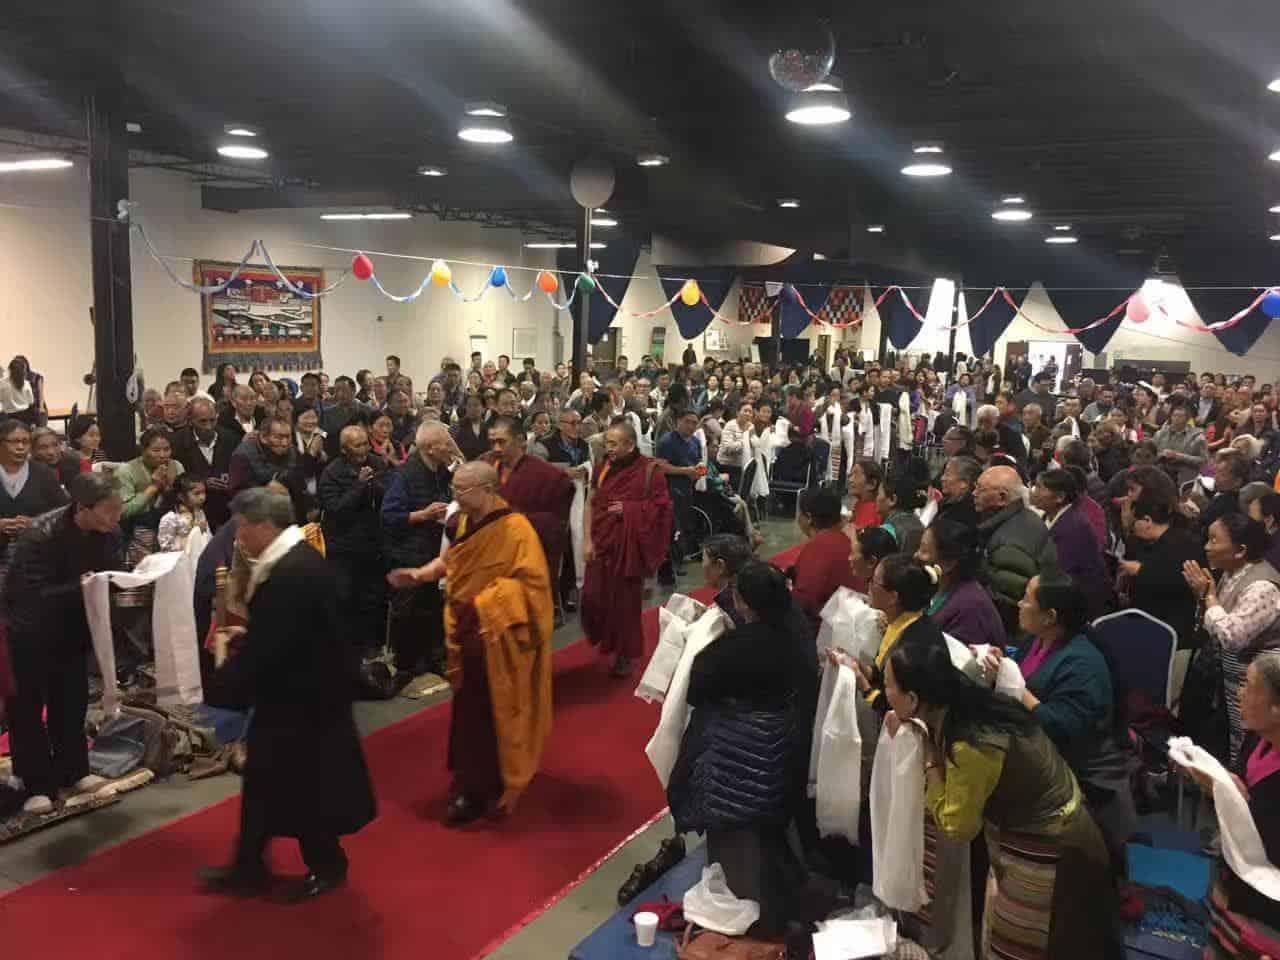 Gosok Rinpoche Toronto 2017-04 006 75e4c04bfed638cad59dd568d6f2695